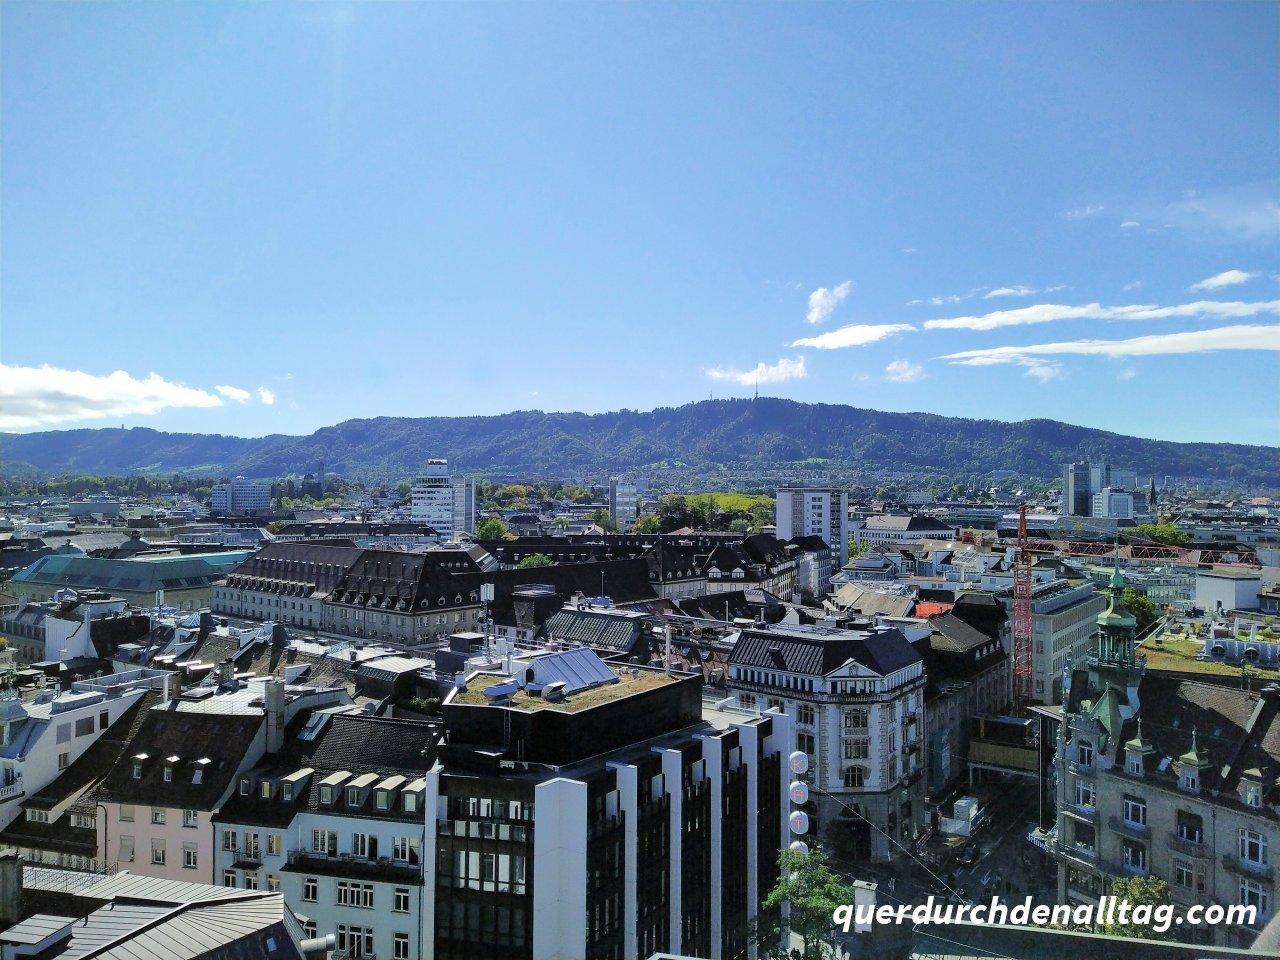 Urania Sternwarte Zürich